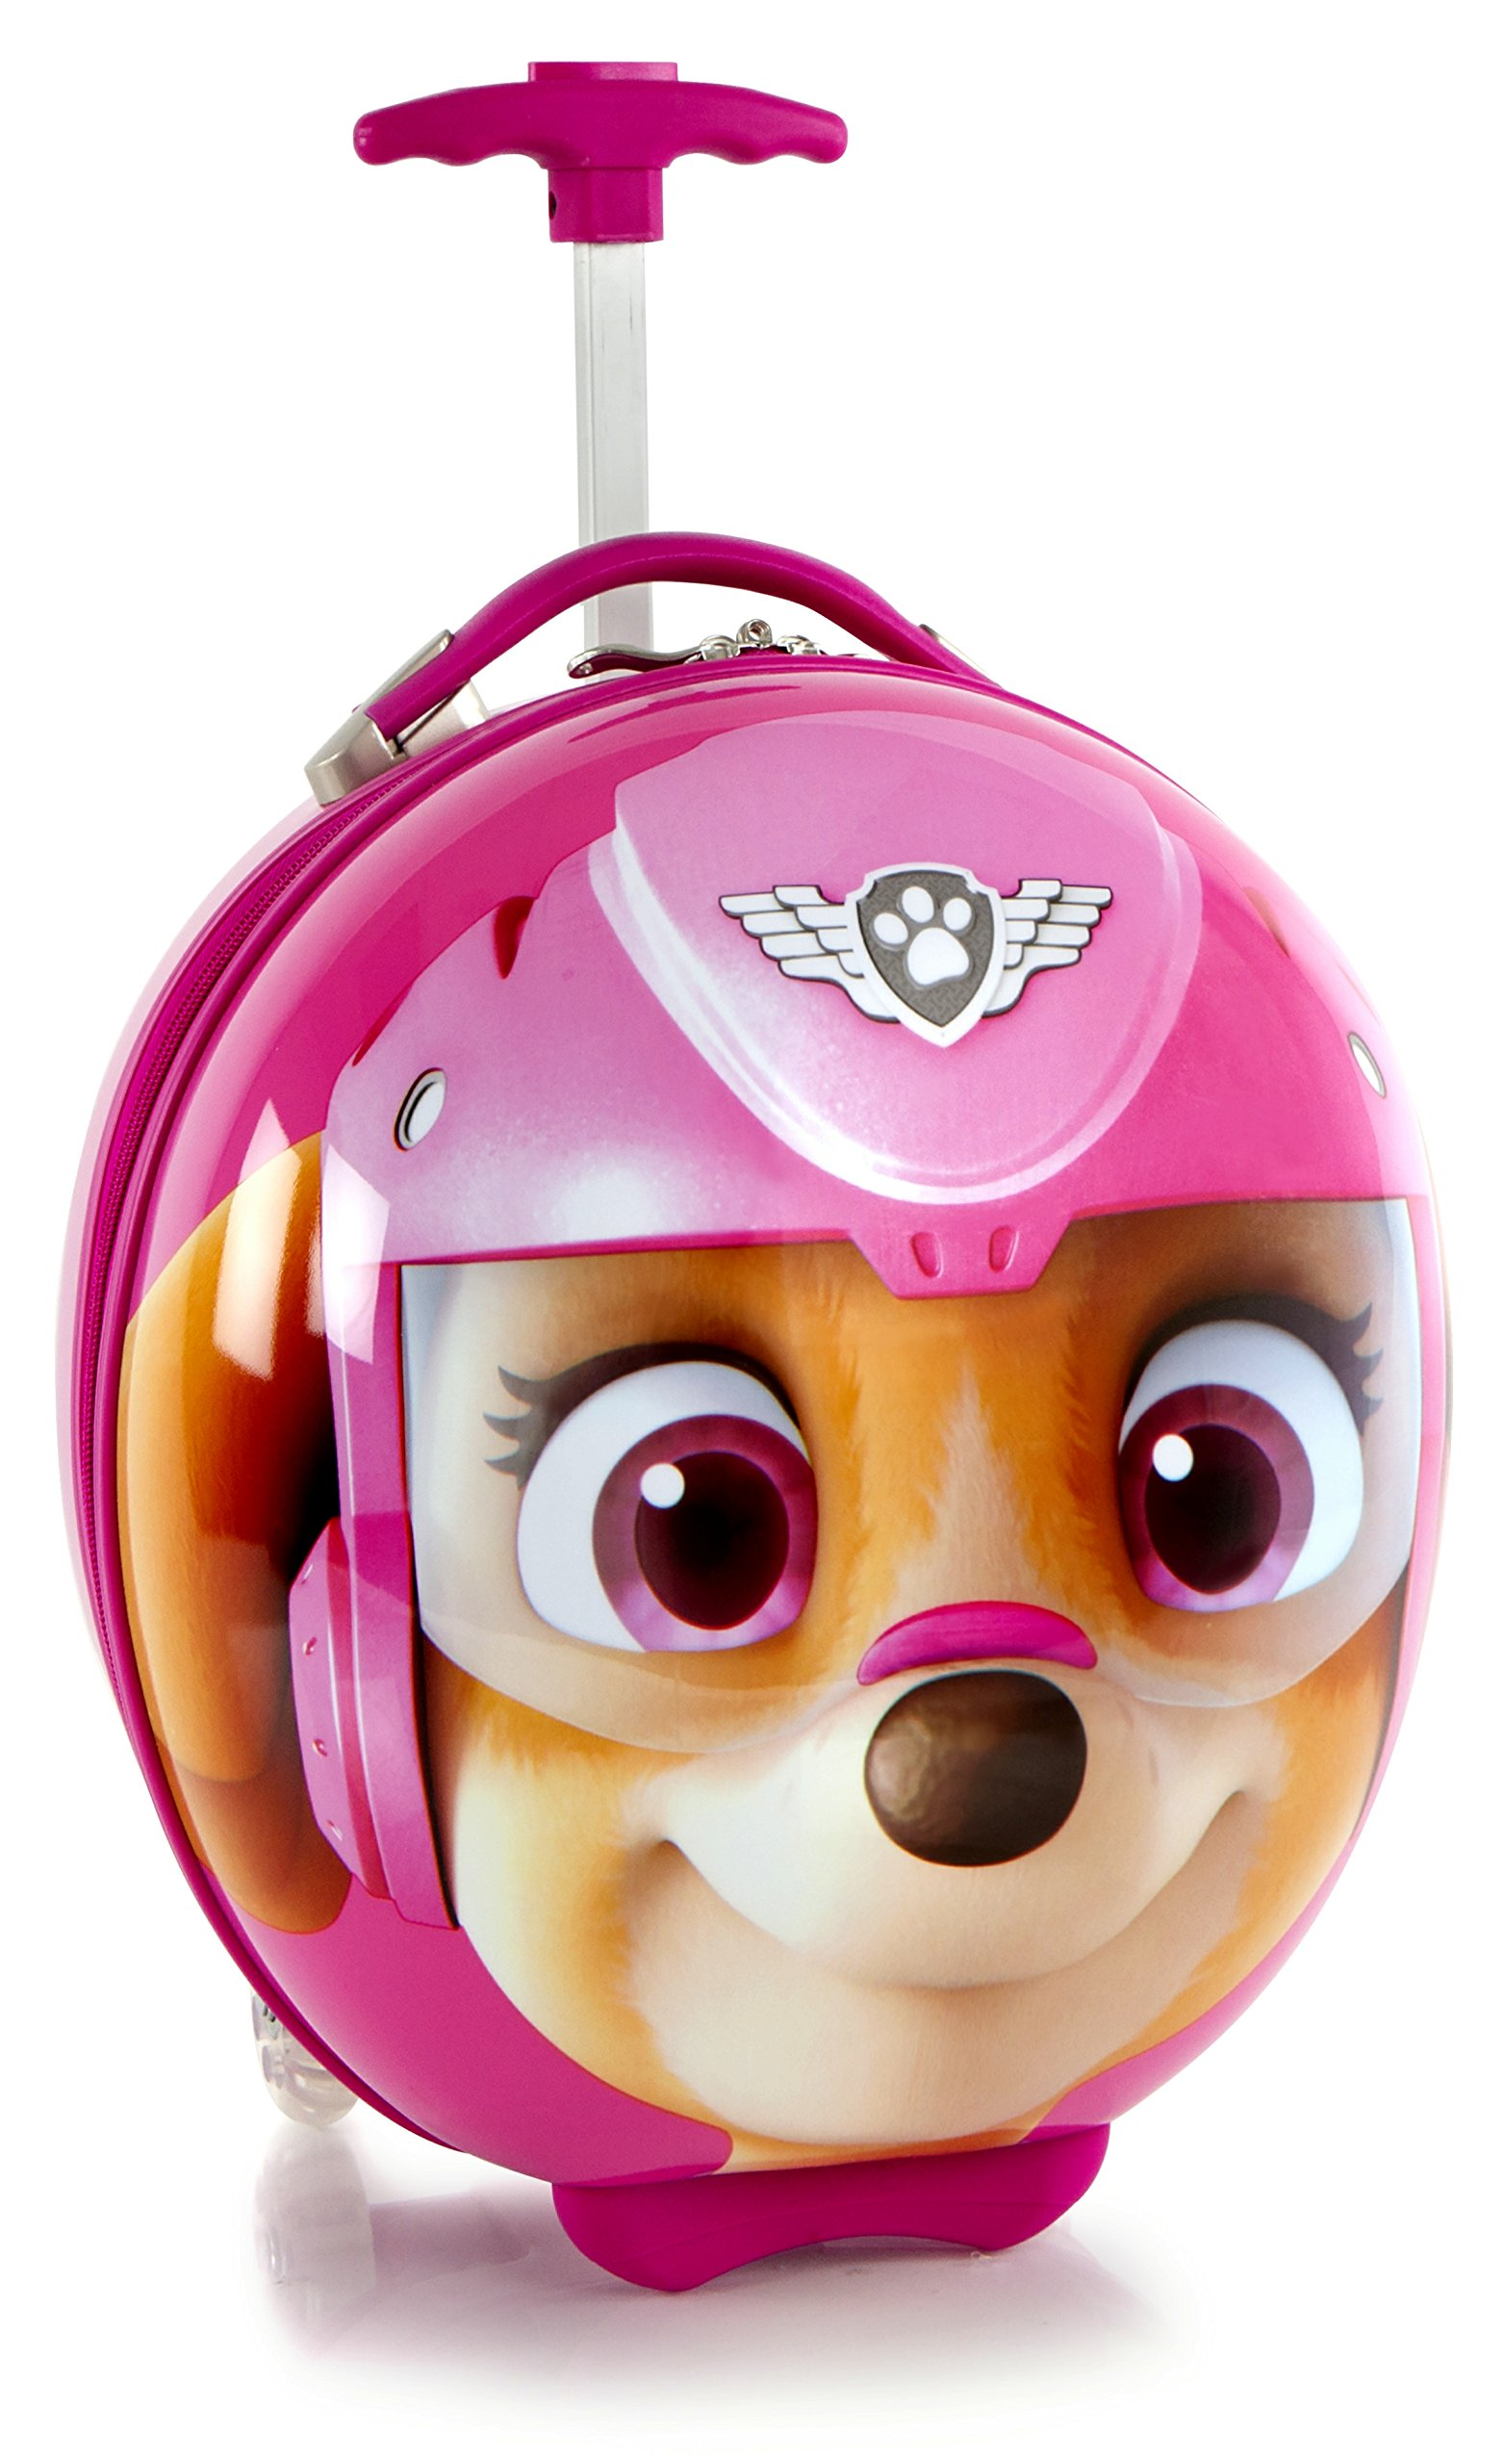 Heys America Unisex Nickelodeon Paw Patrol Circle Shape Kids Luggage Sky One Size